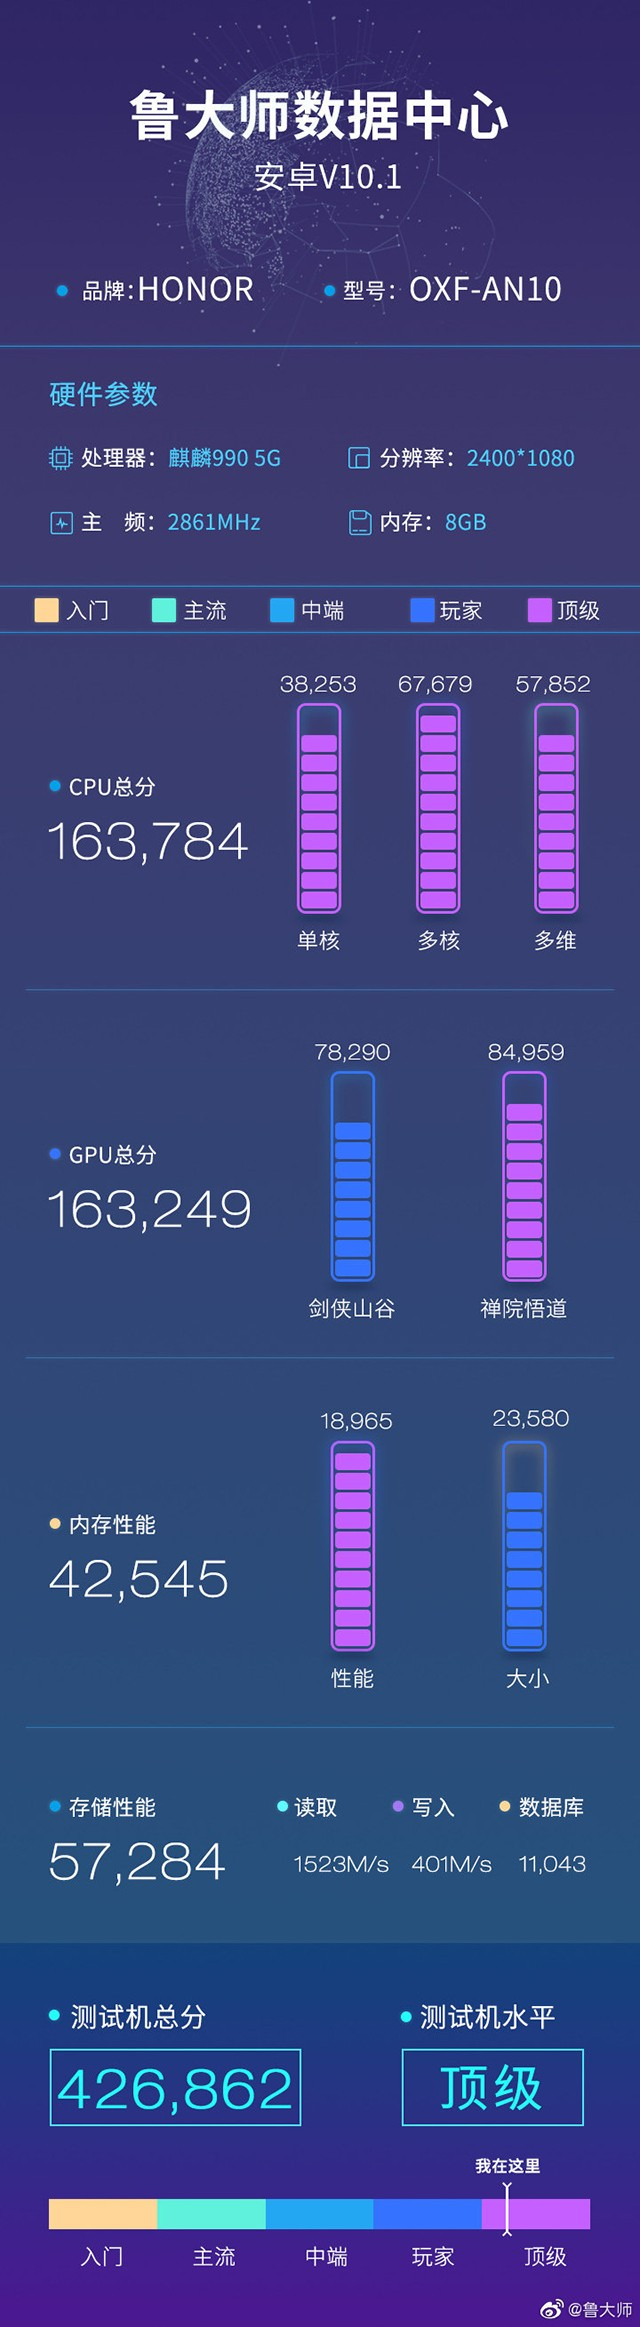 stream交易平台官网 - 中国速度再创造一历史 001A将碾压俄日英法四国航母